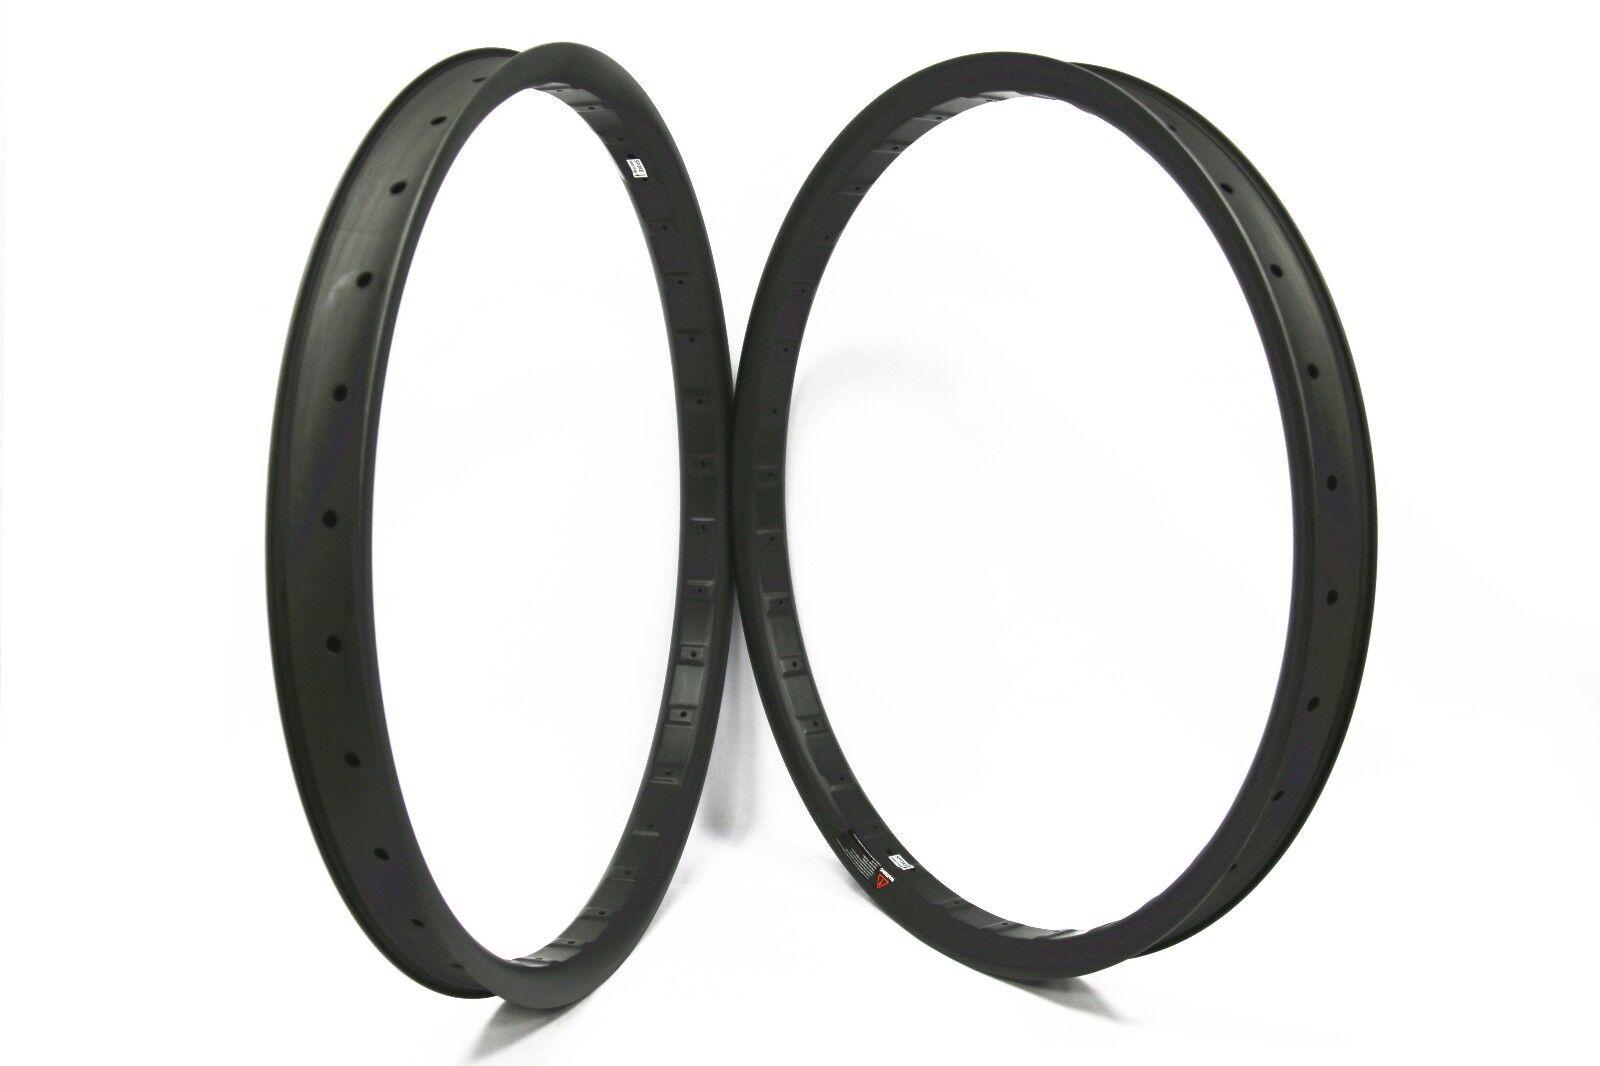 27.5er+ plus  42mm Width Carbon MTB Bicycle Rim for AM CX DH Tubeless Compatible  comfortable